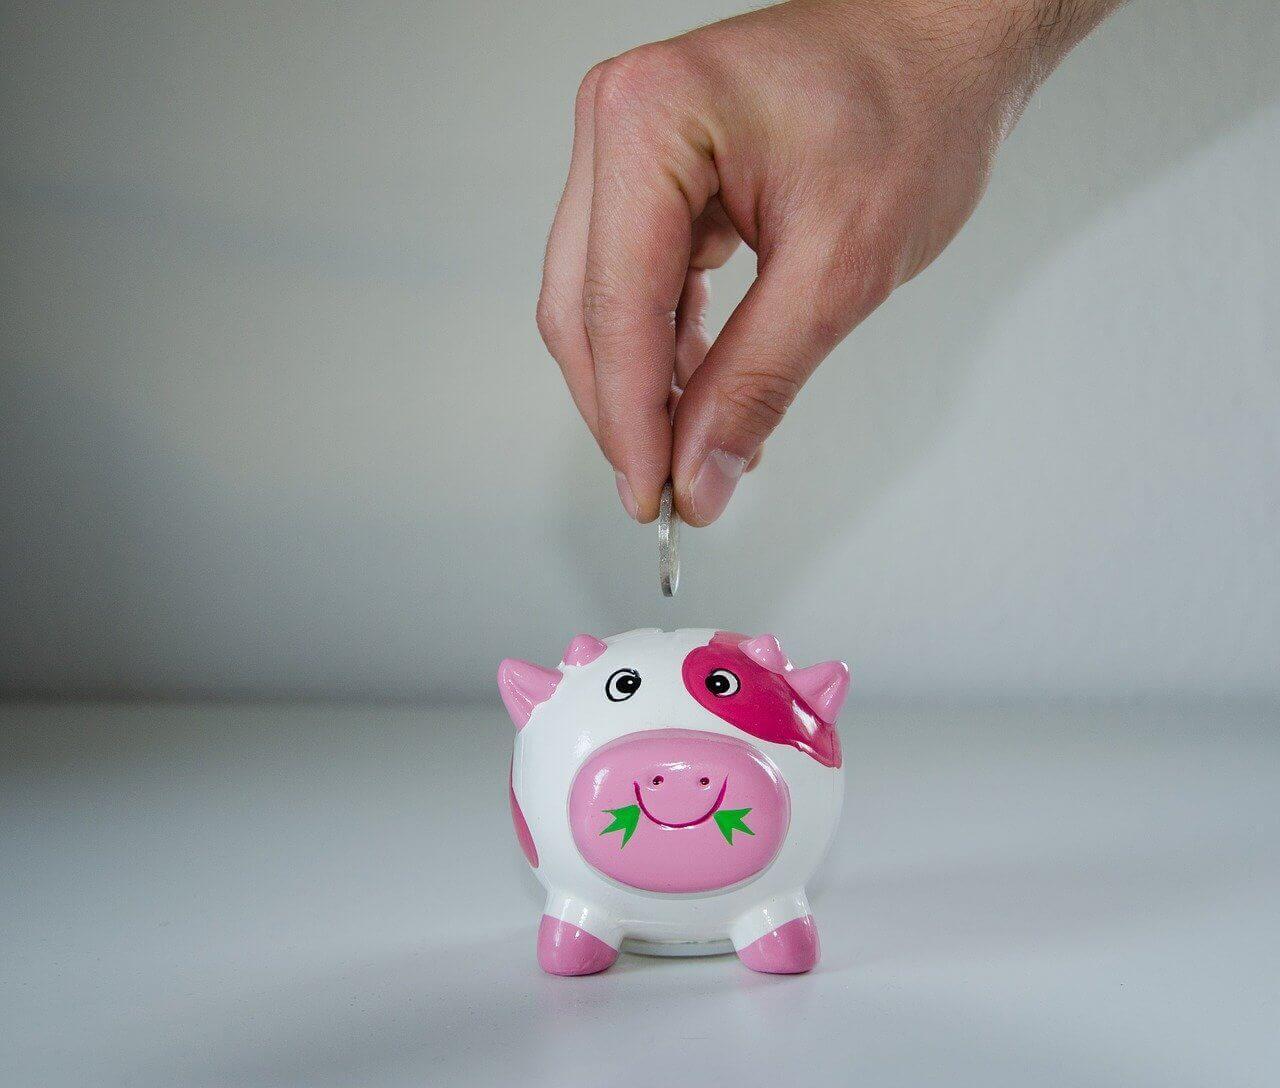 Useful finance tips to help you save money